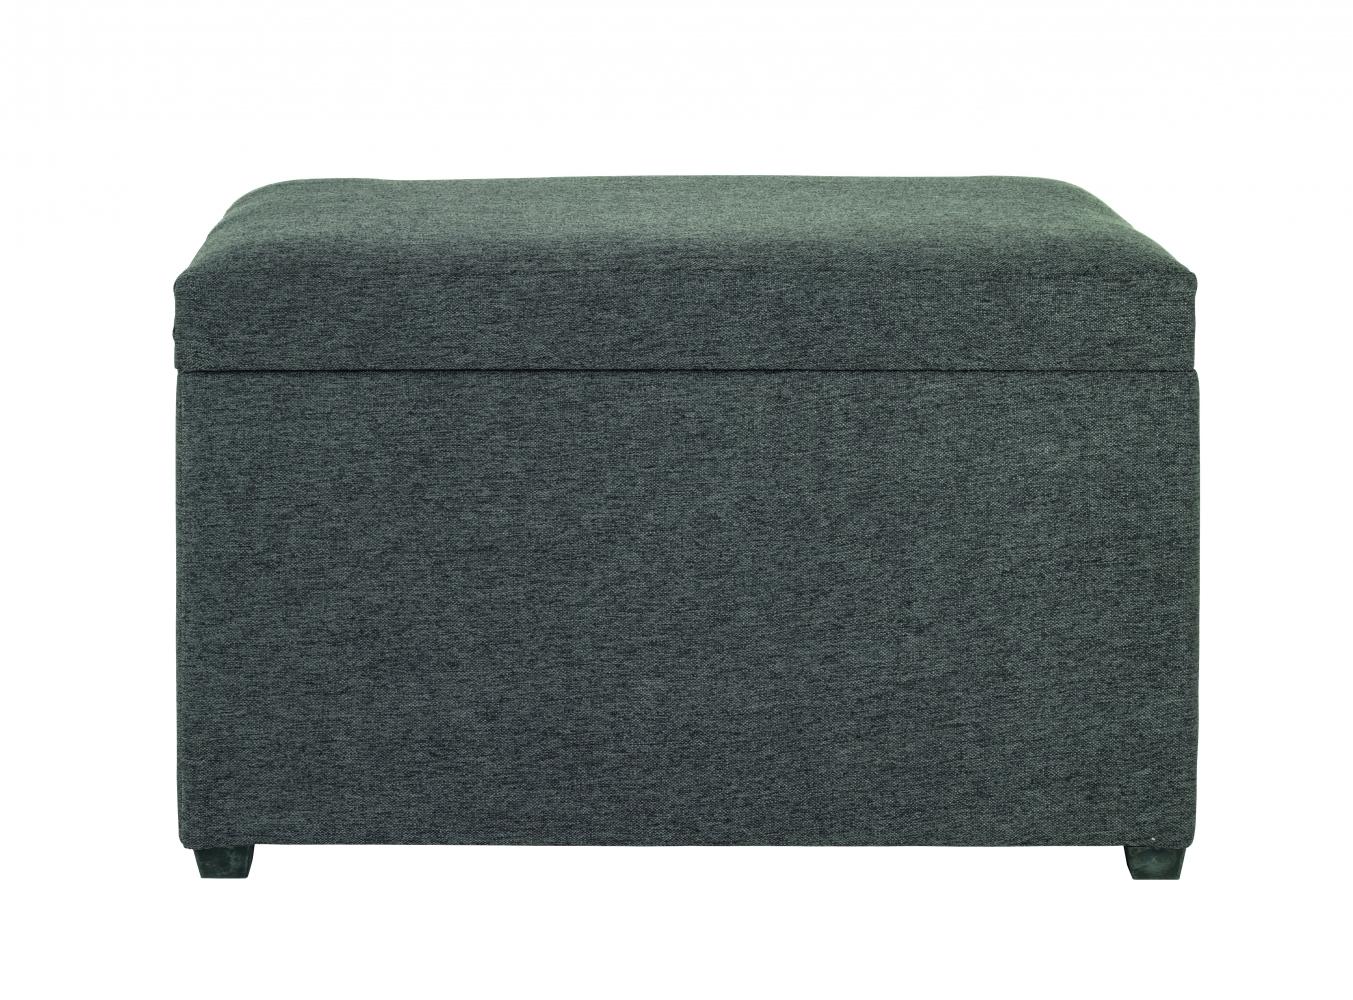 Úložný taburet Monty, 65 cm, tmavě šedá